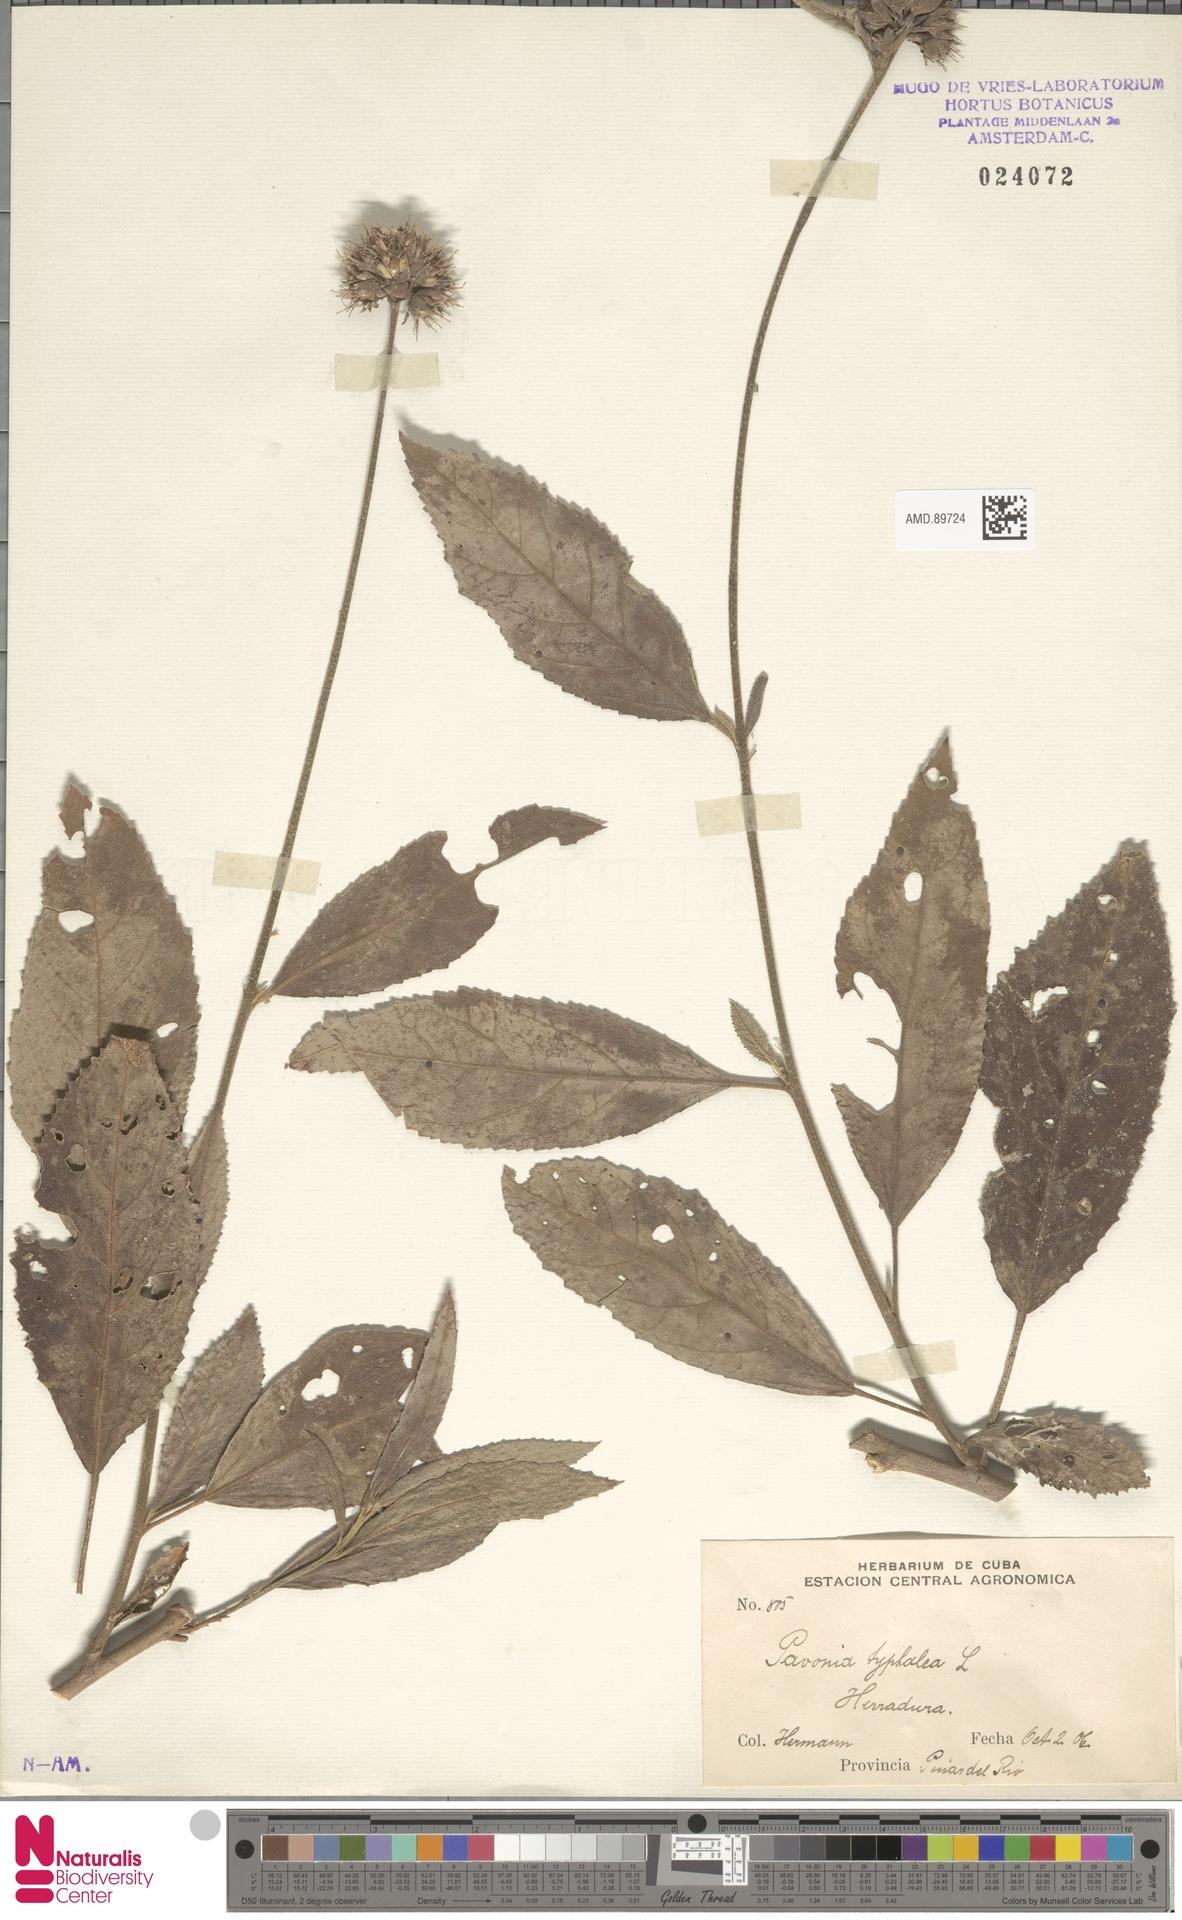 AMD.89724 | Pavonia typhalaea (L.) Cav.